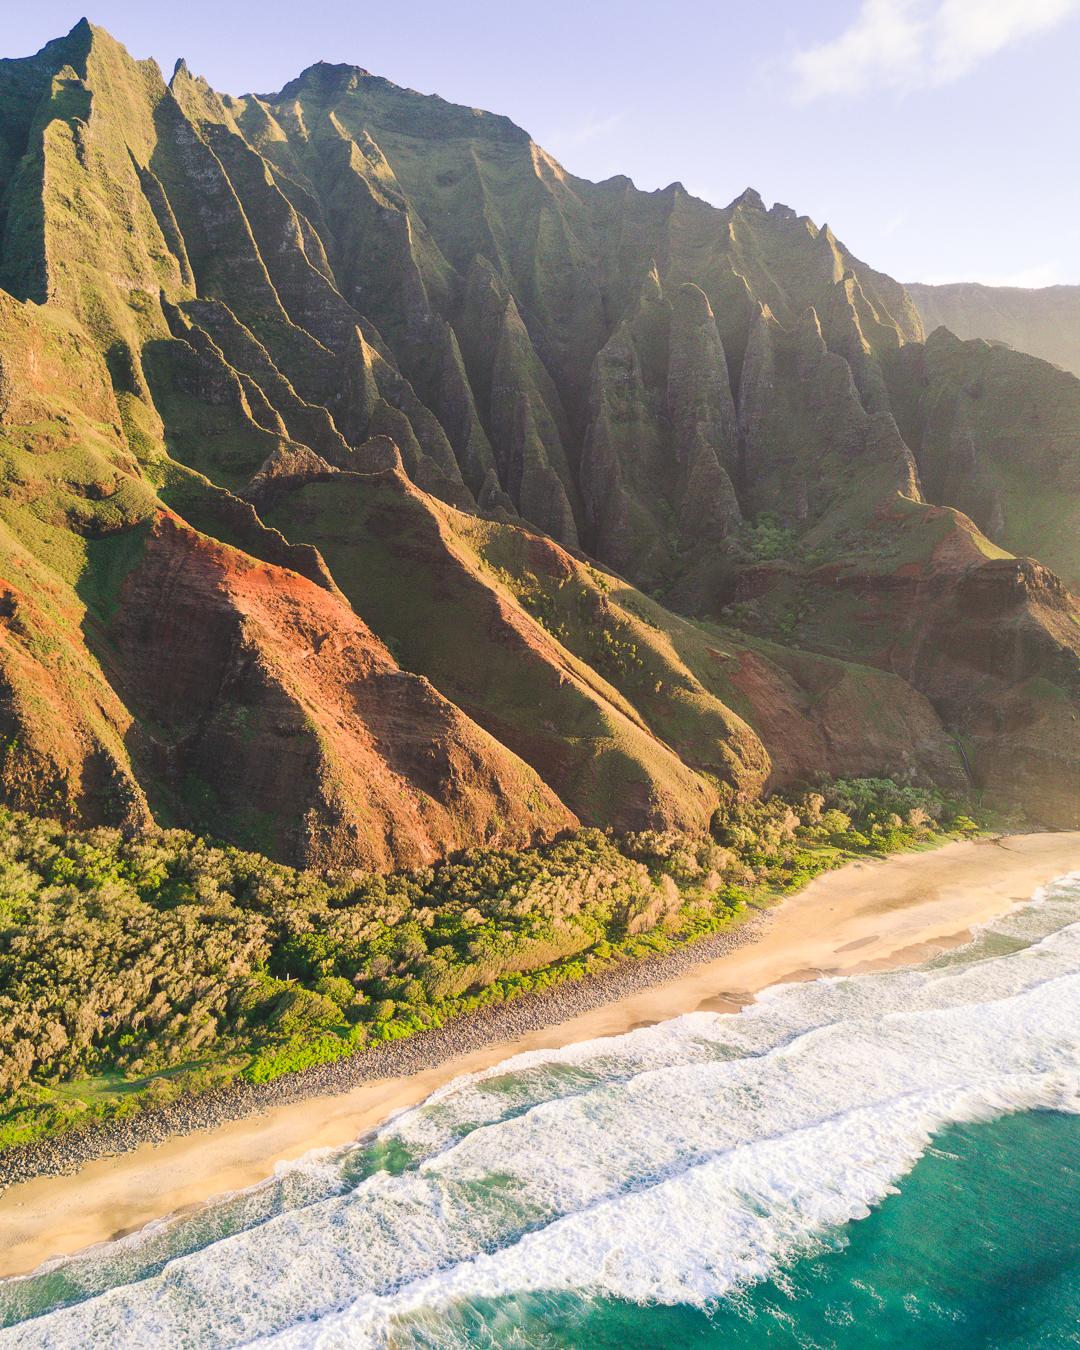 The famous ridges that define the Na Pali Coast in Kauai.